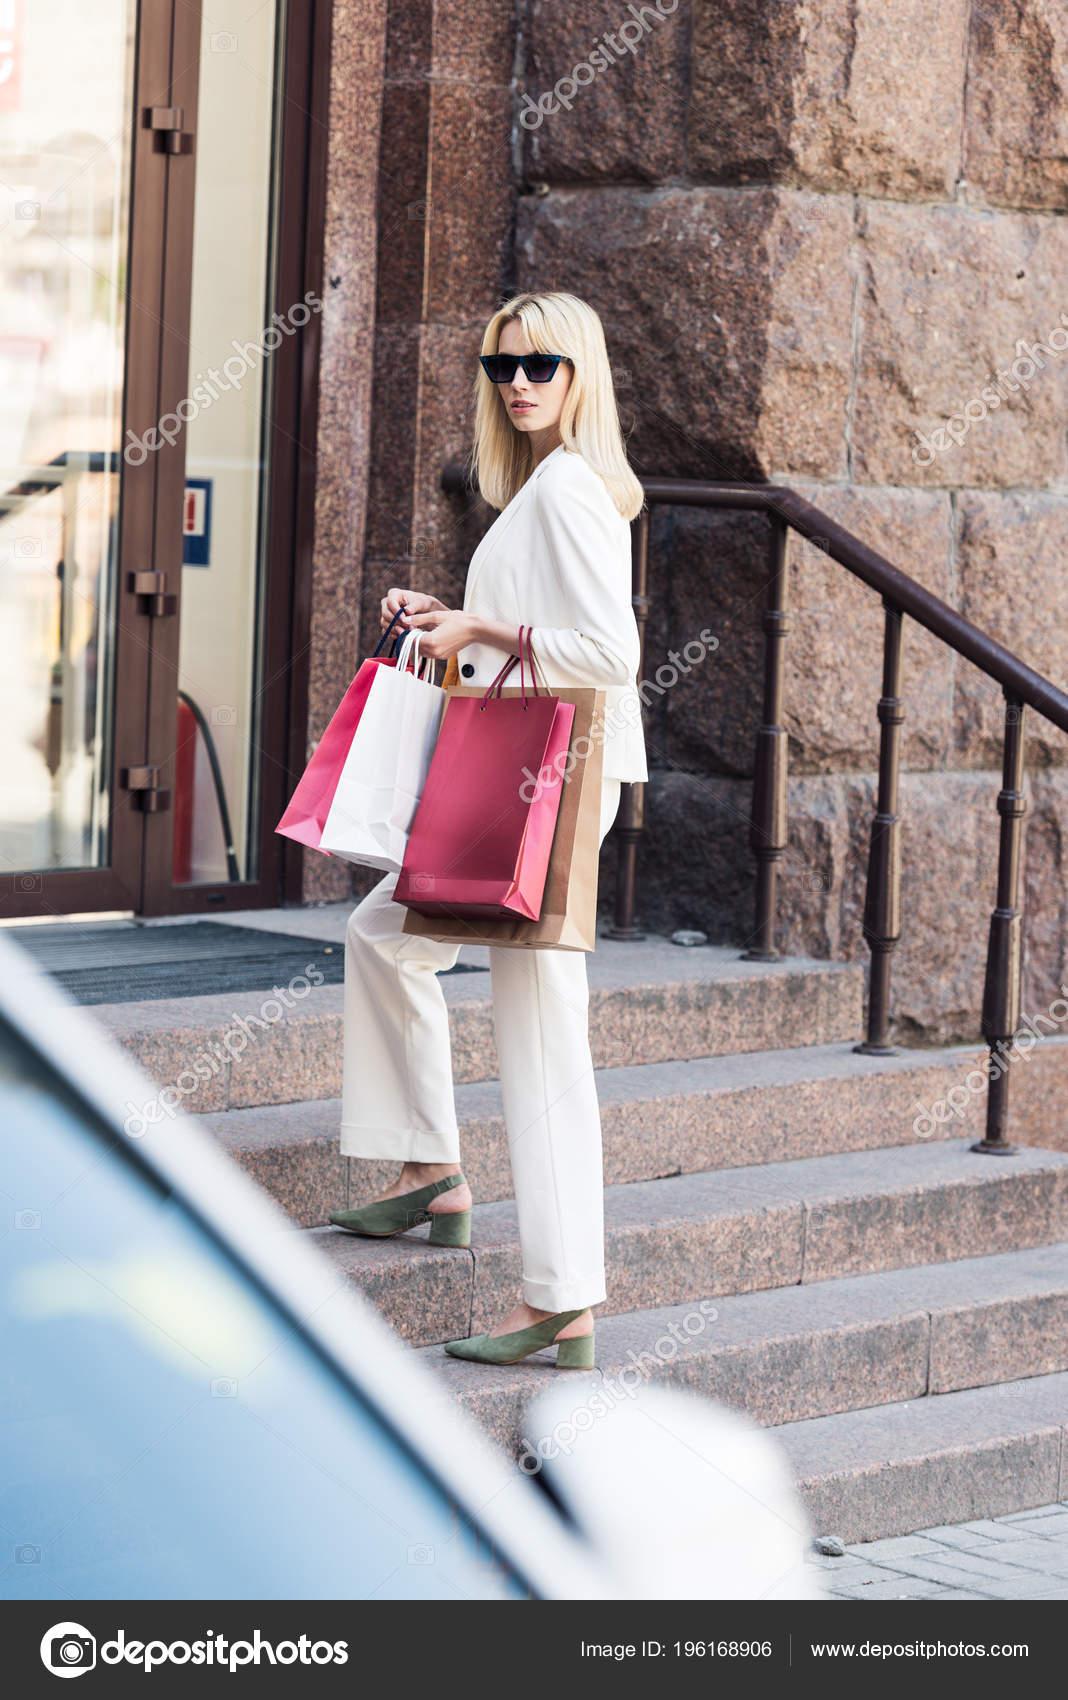 f83c117112 Όμορφη Μόδας Ξανθιά Γυναίκα Κρατώντας Τσάντες Για Ψώνια Και Στέκεται — Φωτογραφία  Αρχείου